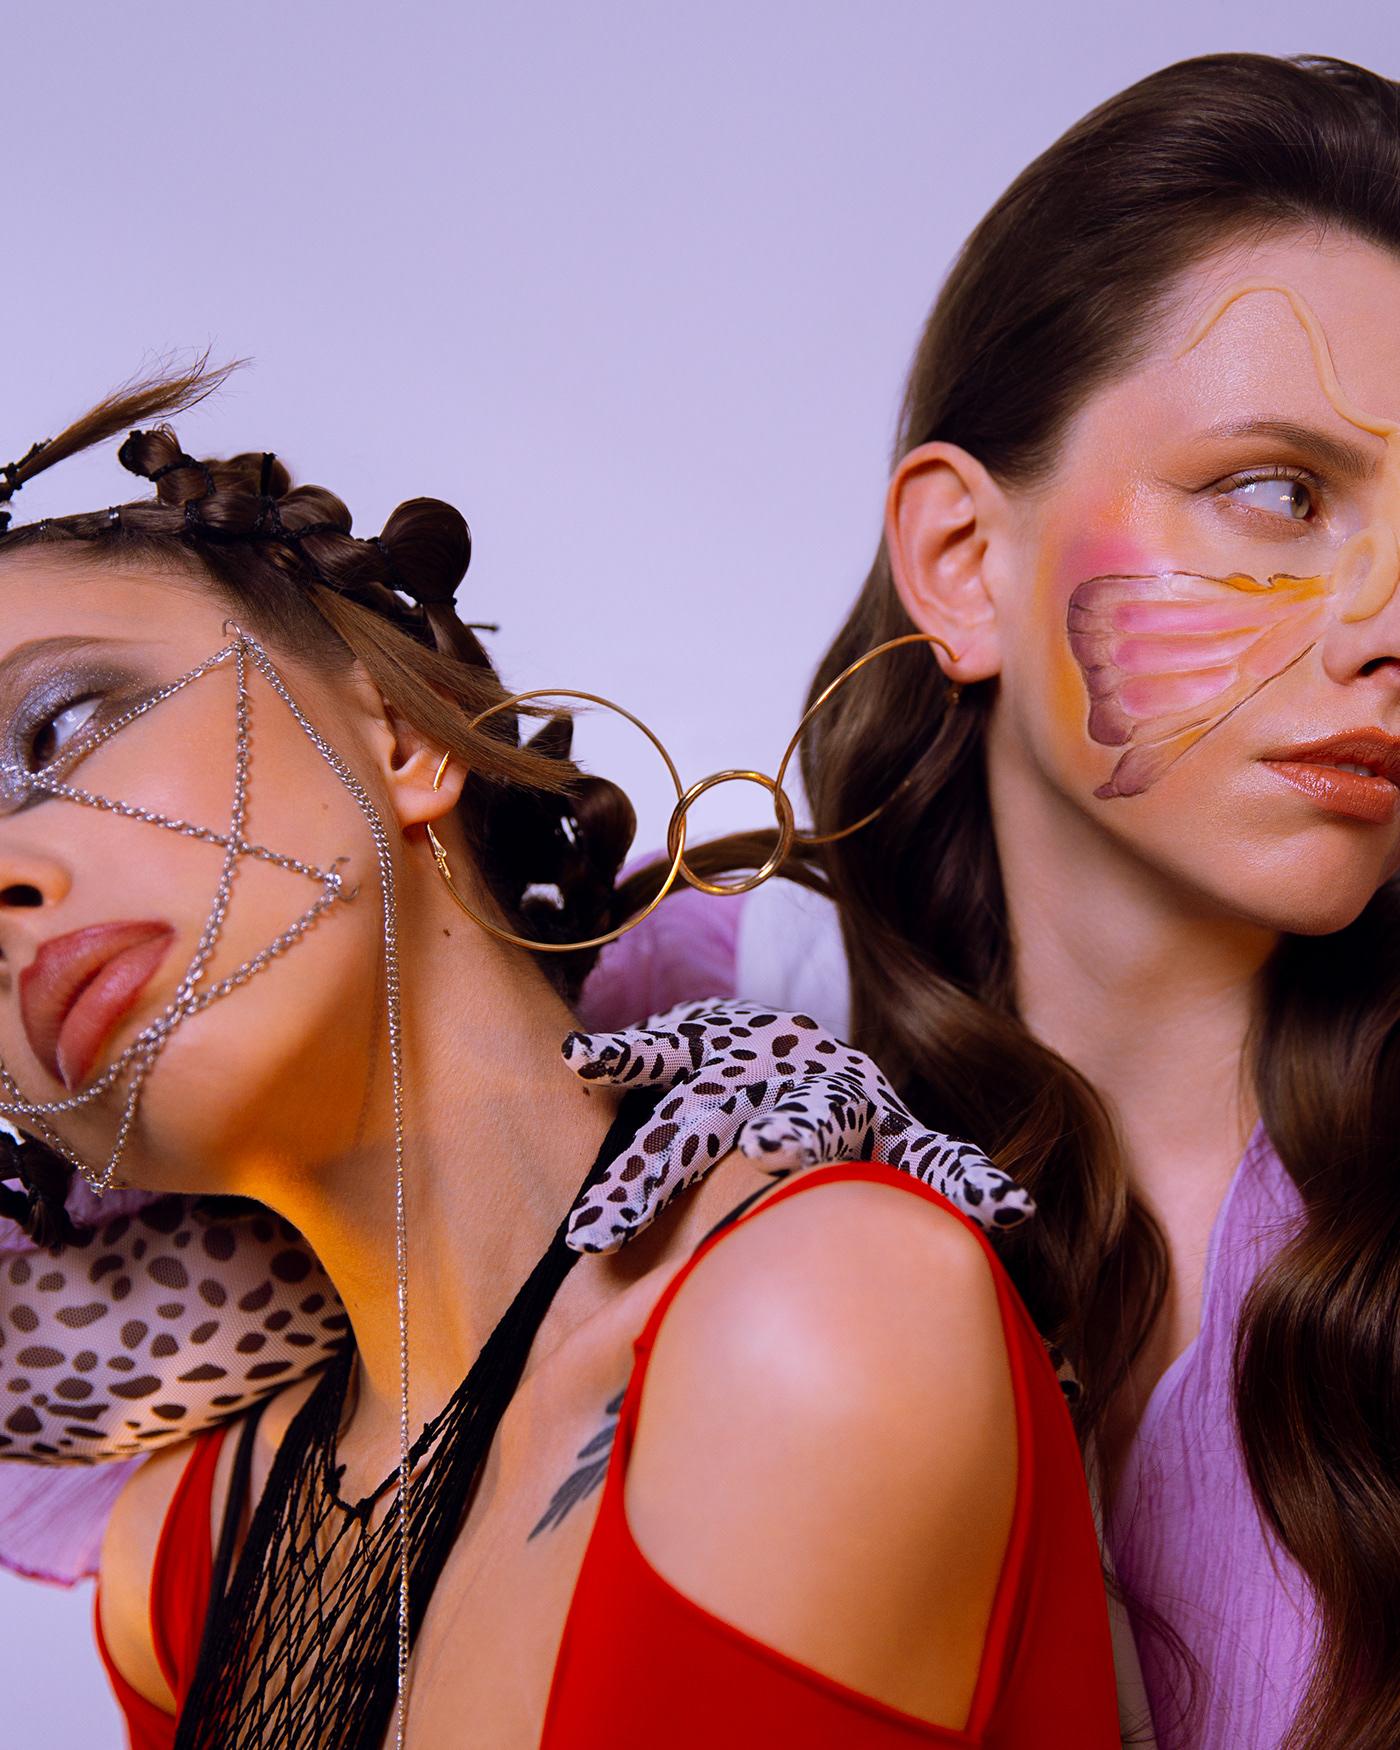 art art photo Fashion  SFX studio